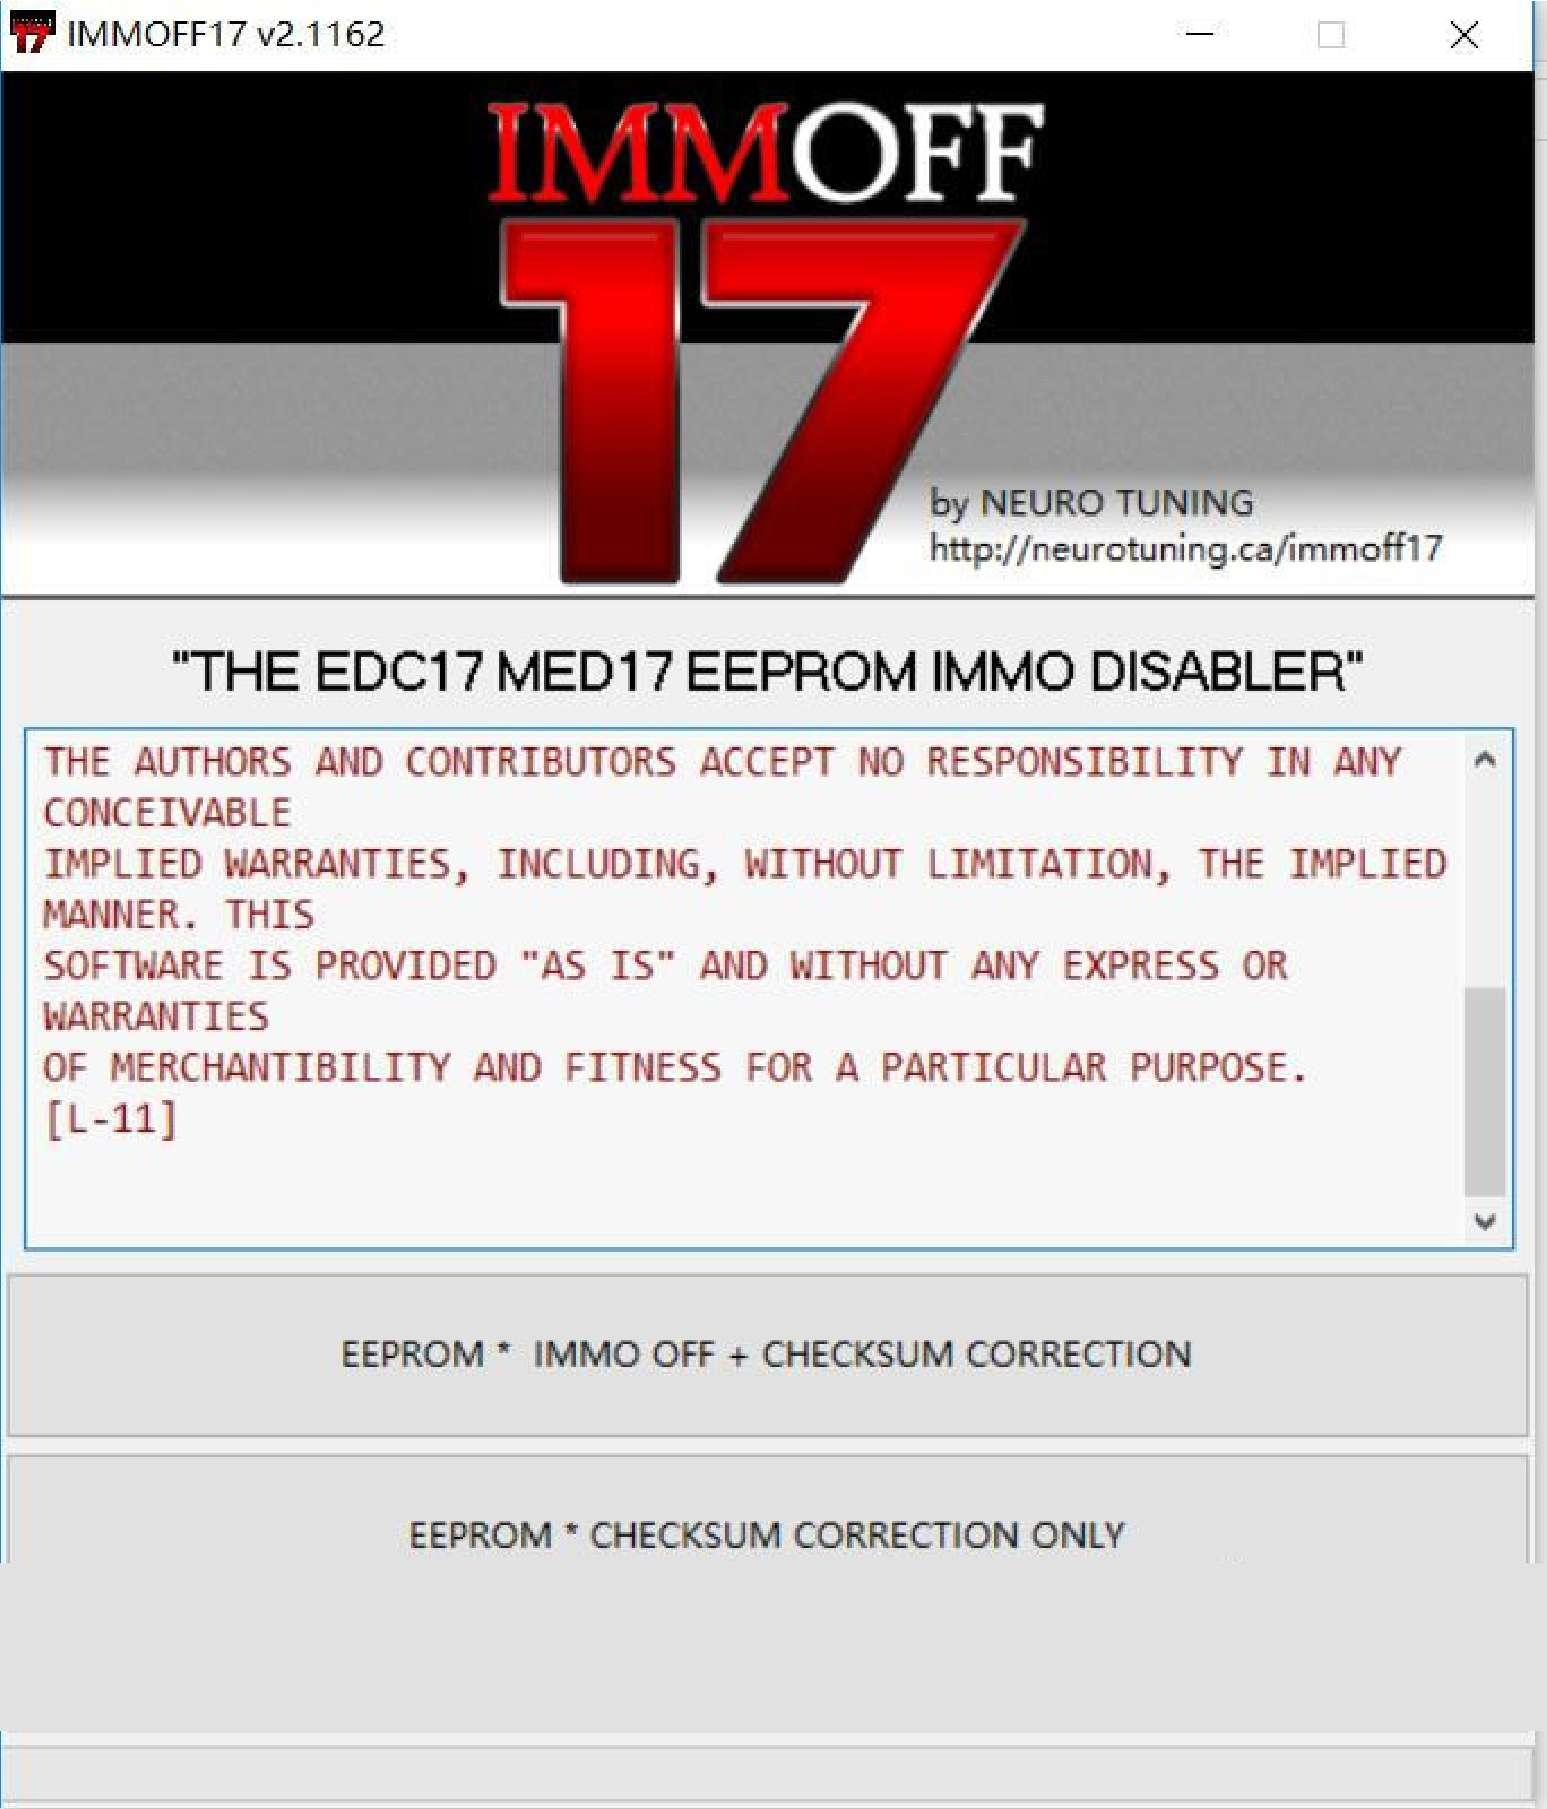 IMMO Off EDC17 MED17 2.2 - Skoda Audi Seat VW Peugeot Citroen Renault Opel ss-01-01